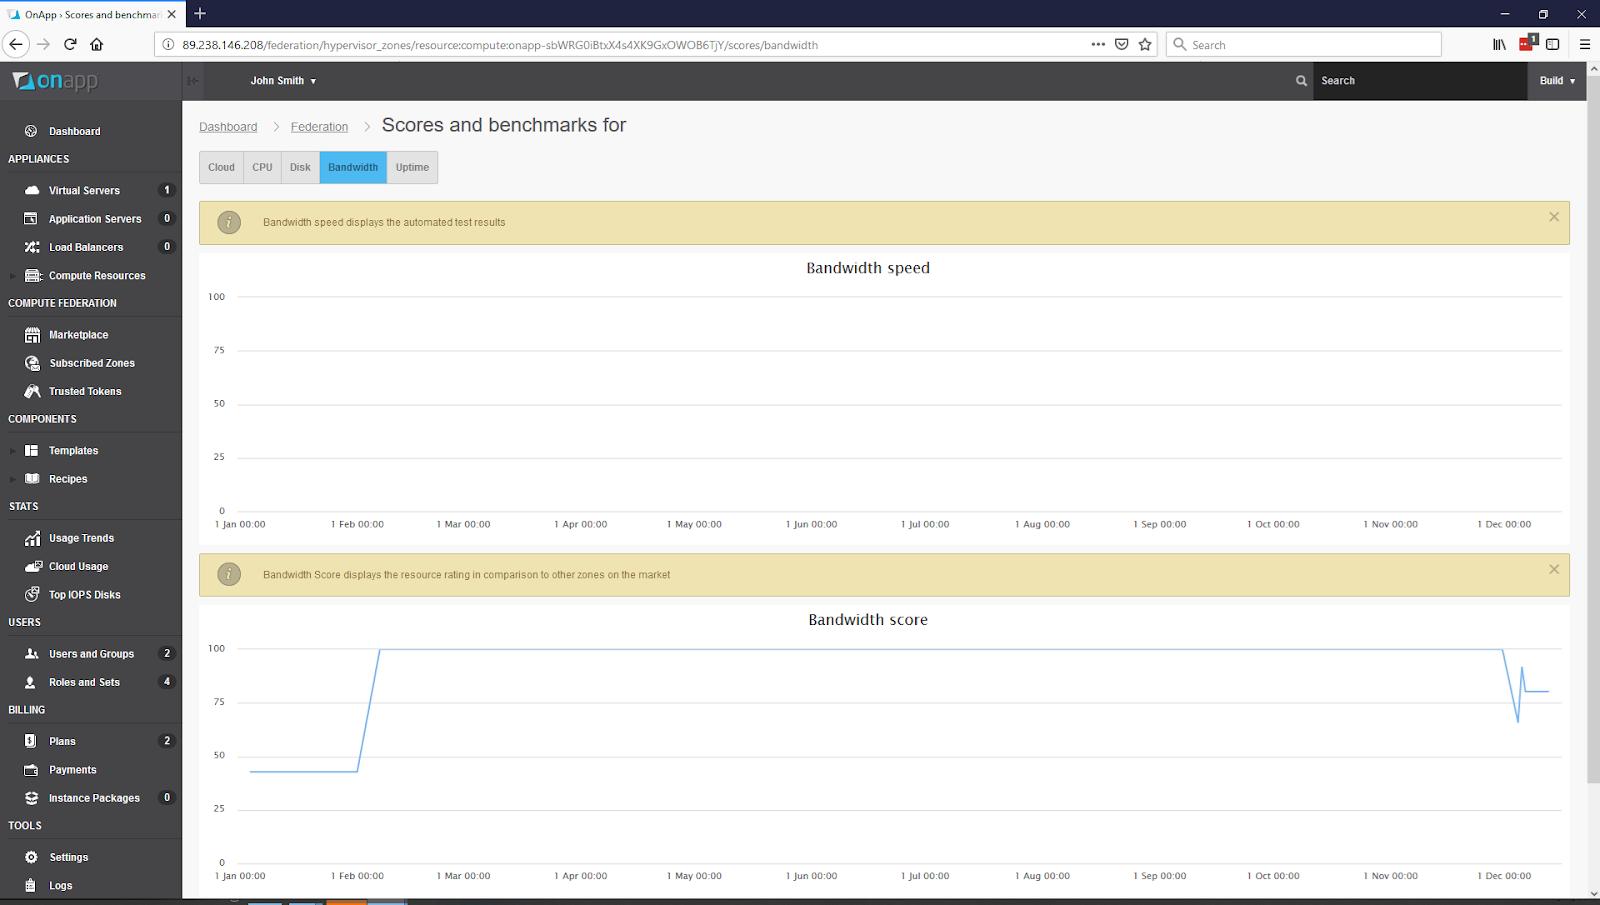 How OnApp reviews federation cloud scores